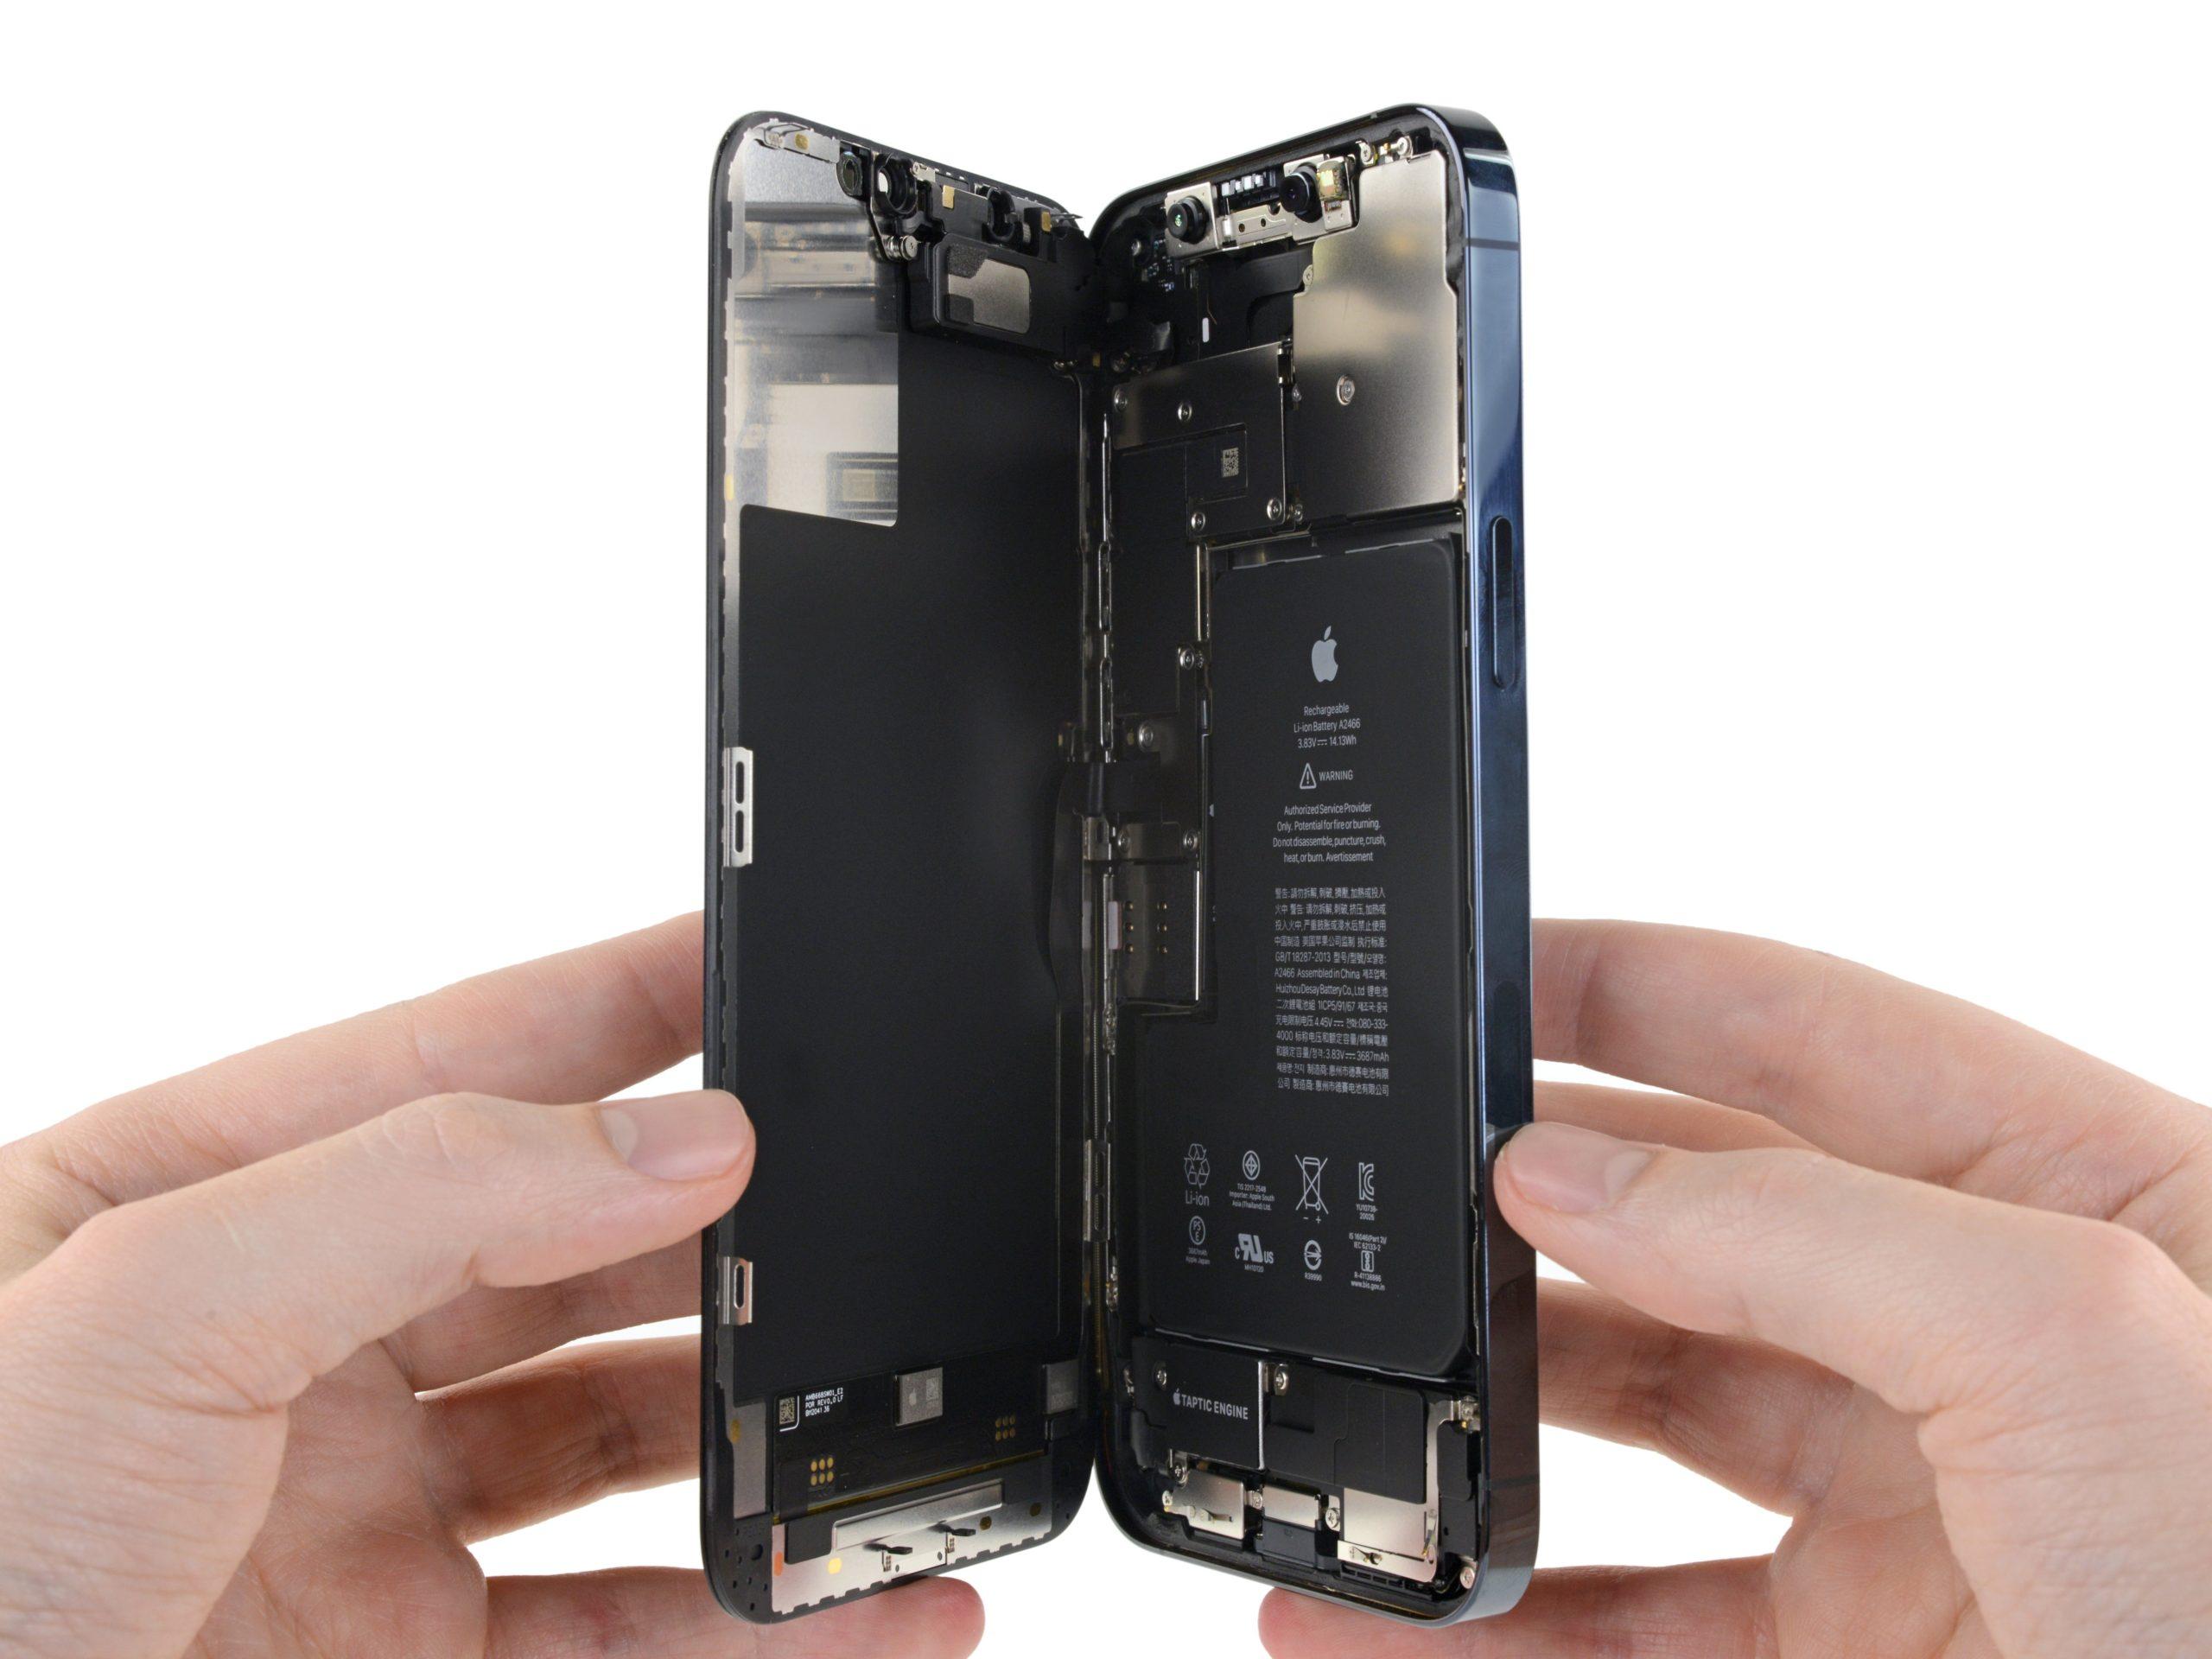 Abriendo el iPhone 12 Pro Max